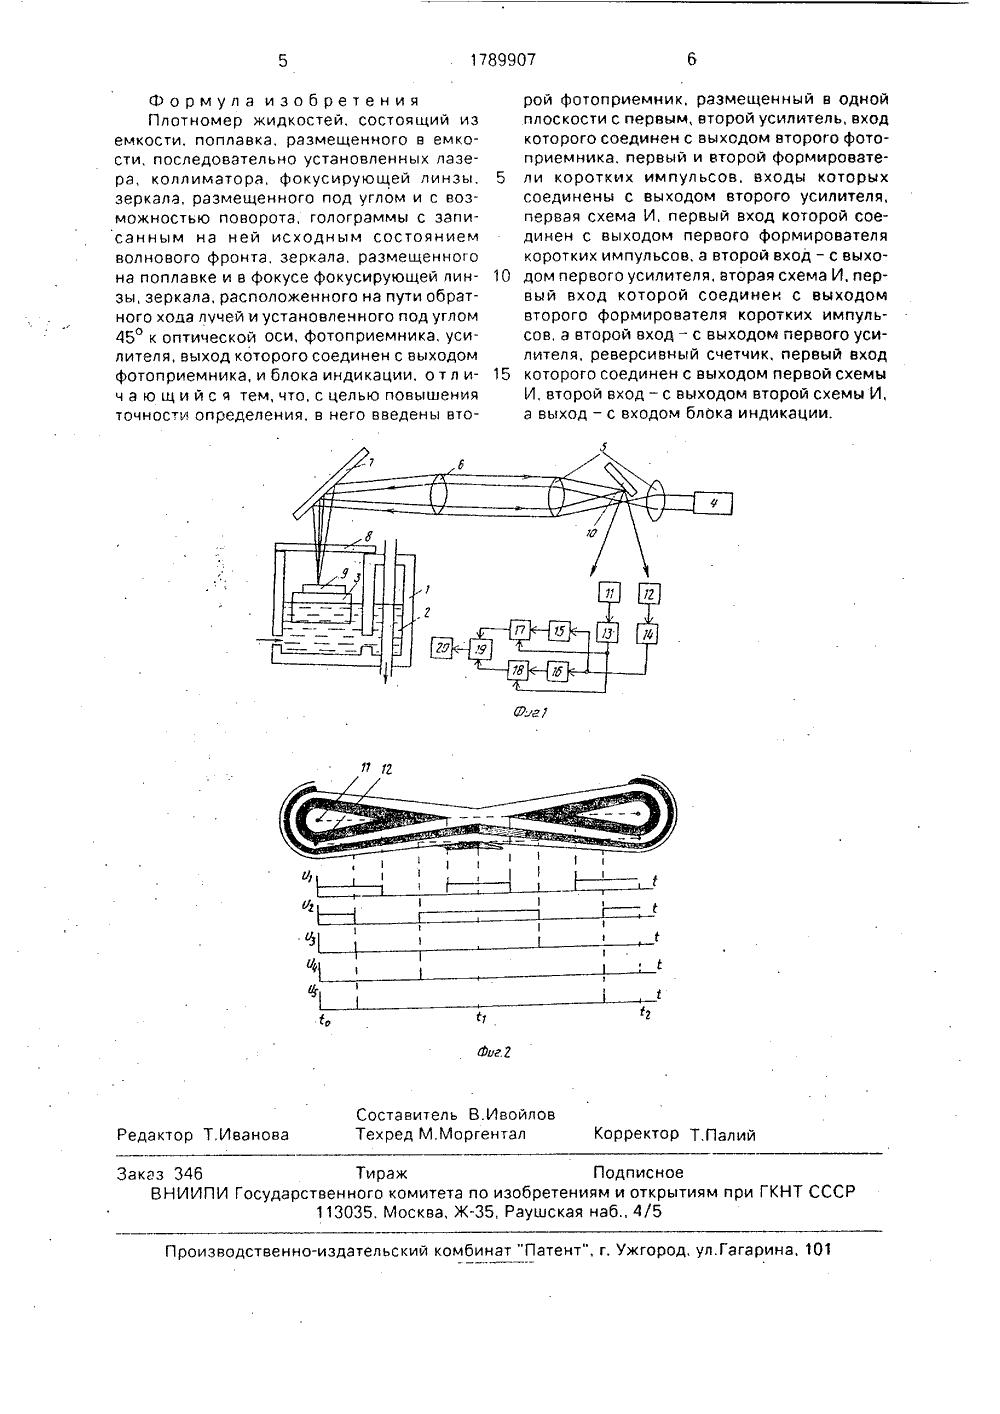 плотномер схема